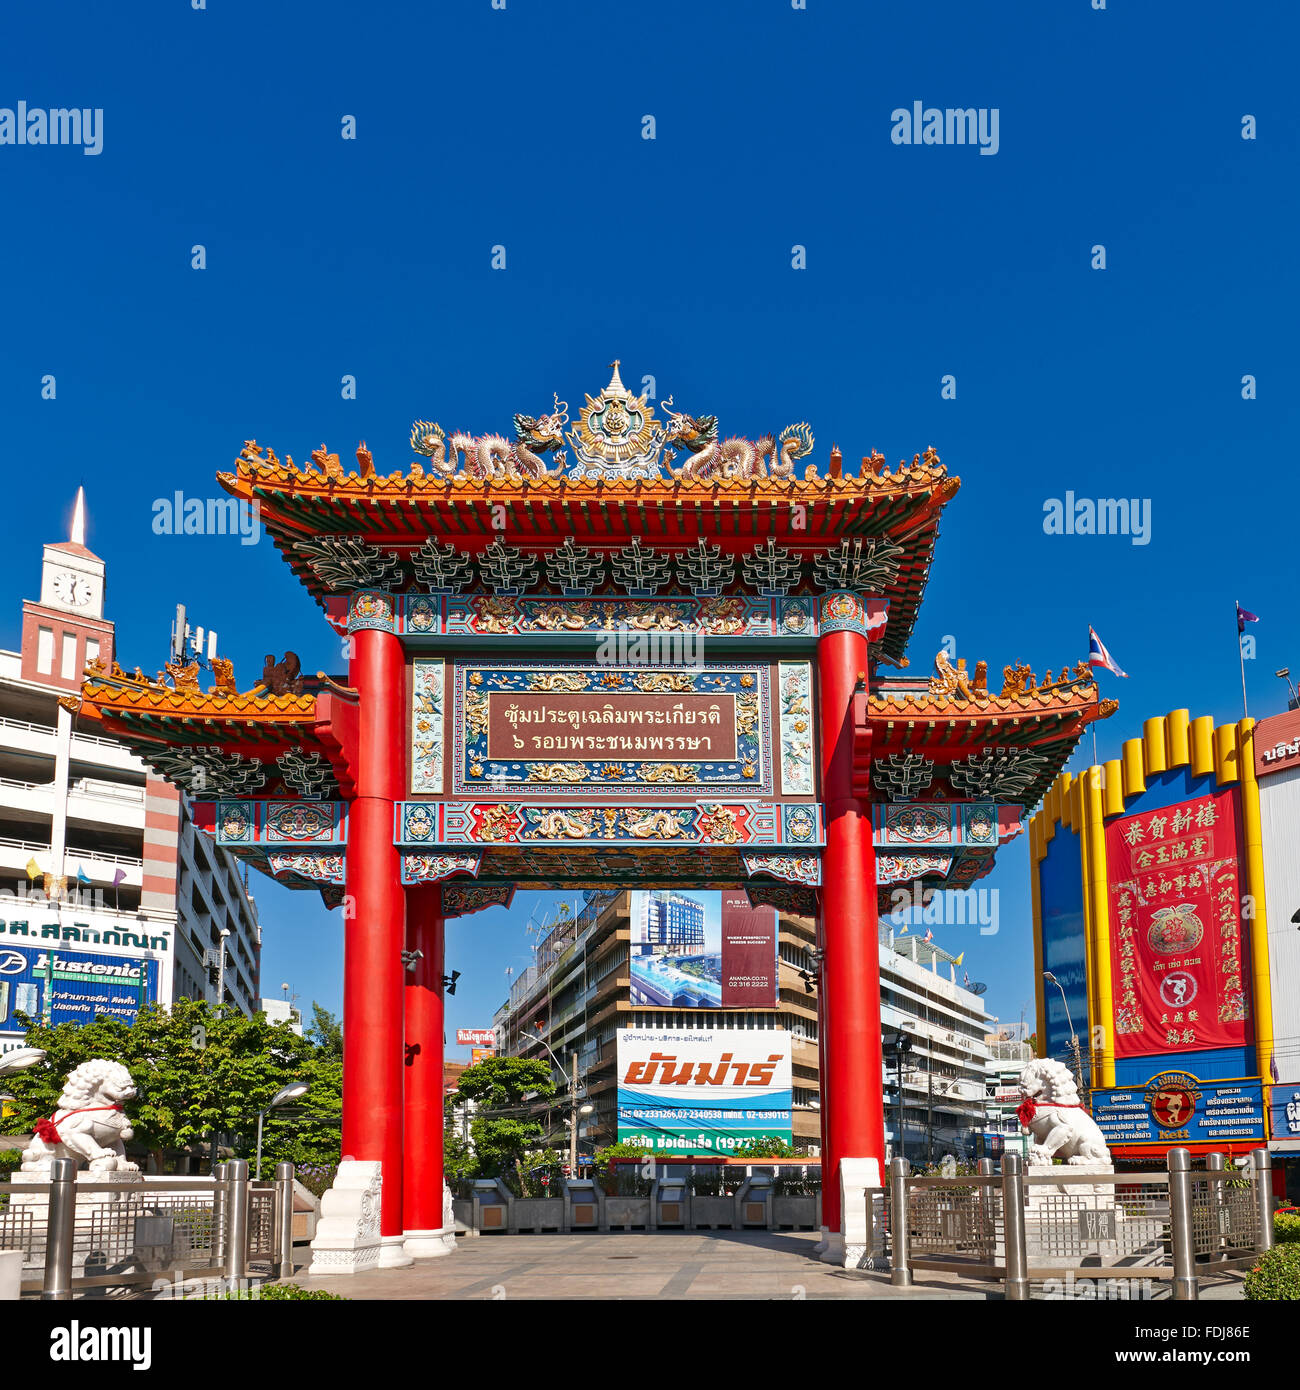 King's Celebration Arch, Chinatown, Bangkok, Thailand. - Stock Image